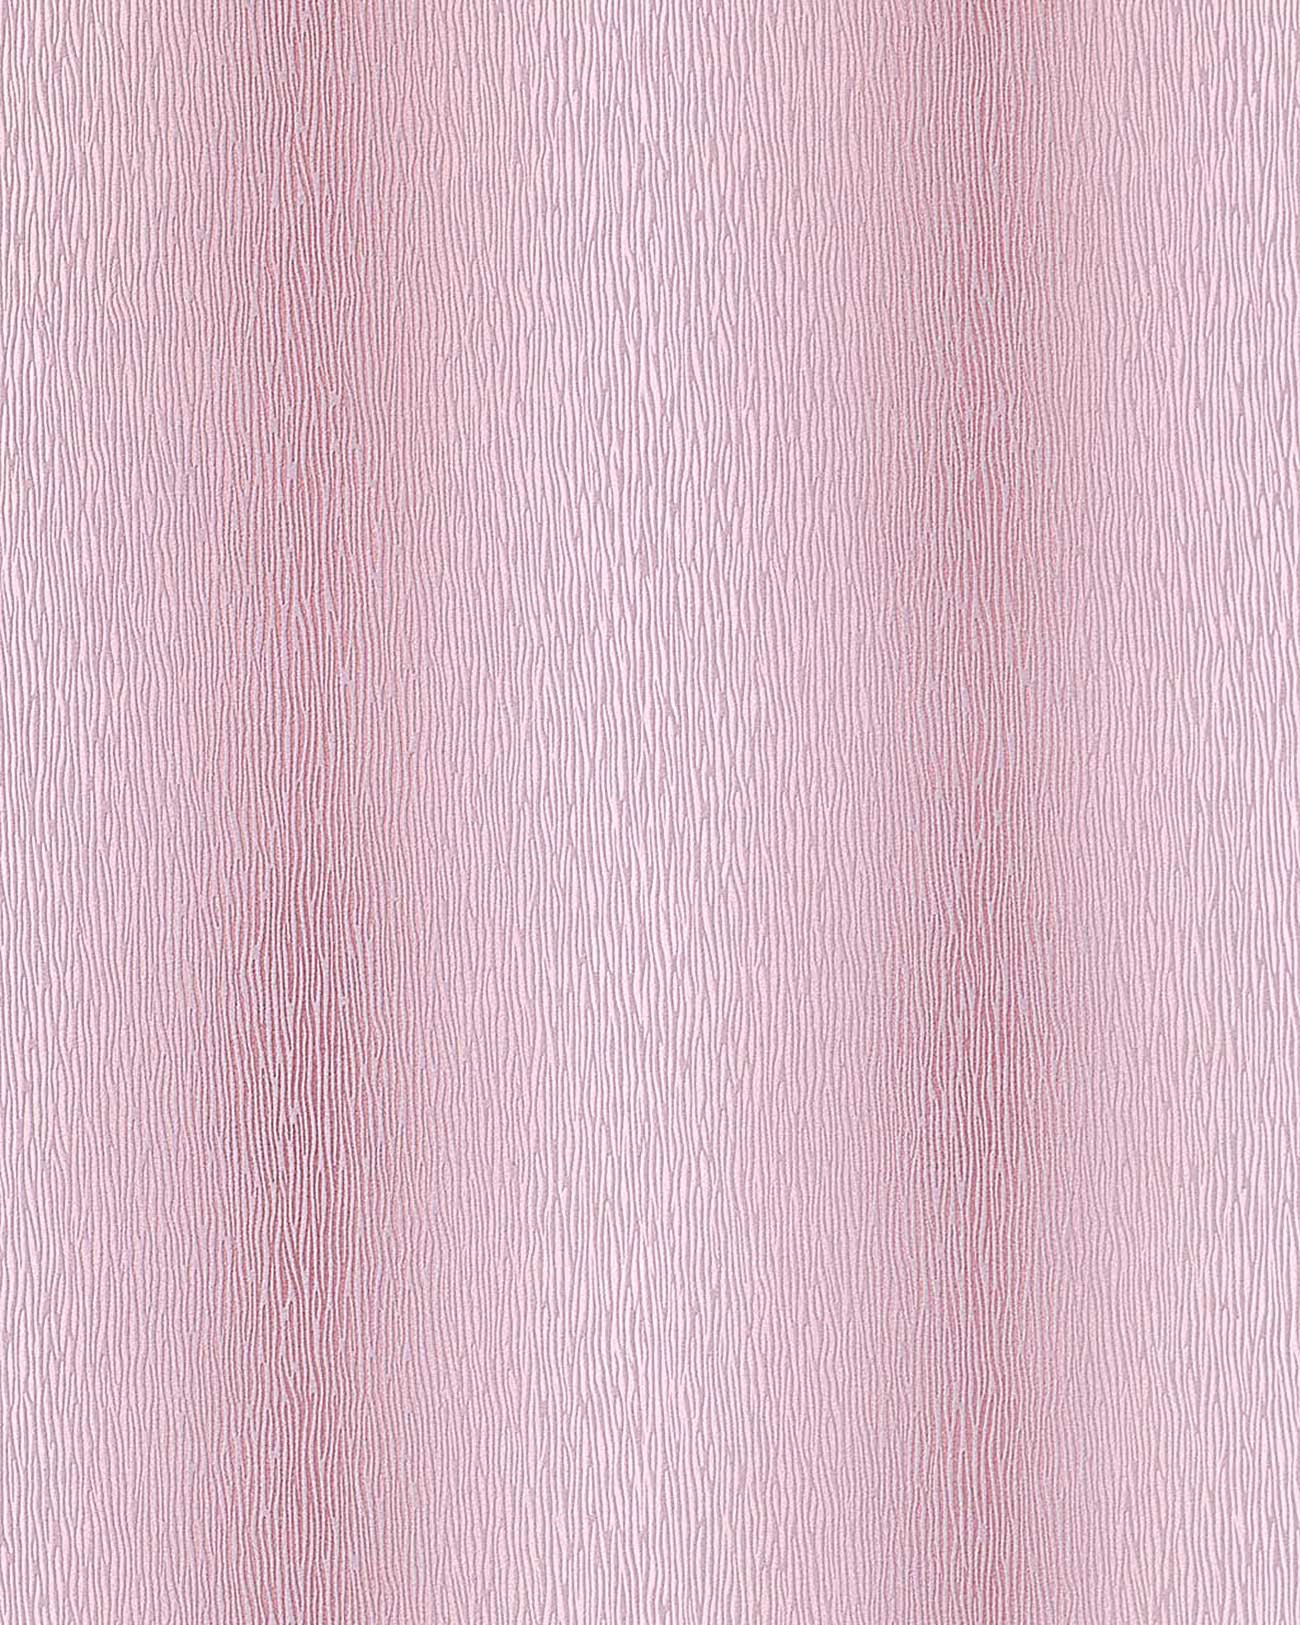 Tapete com flores car interior design for Rosa weiay gestreifte tapete